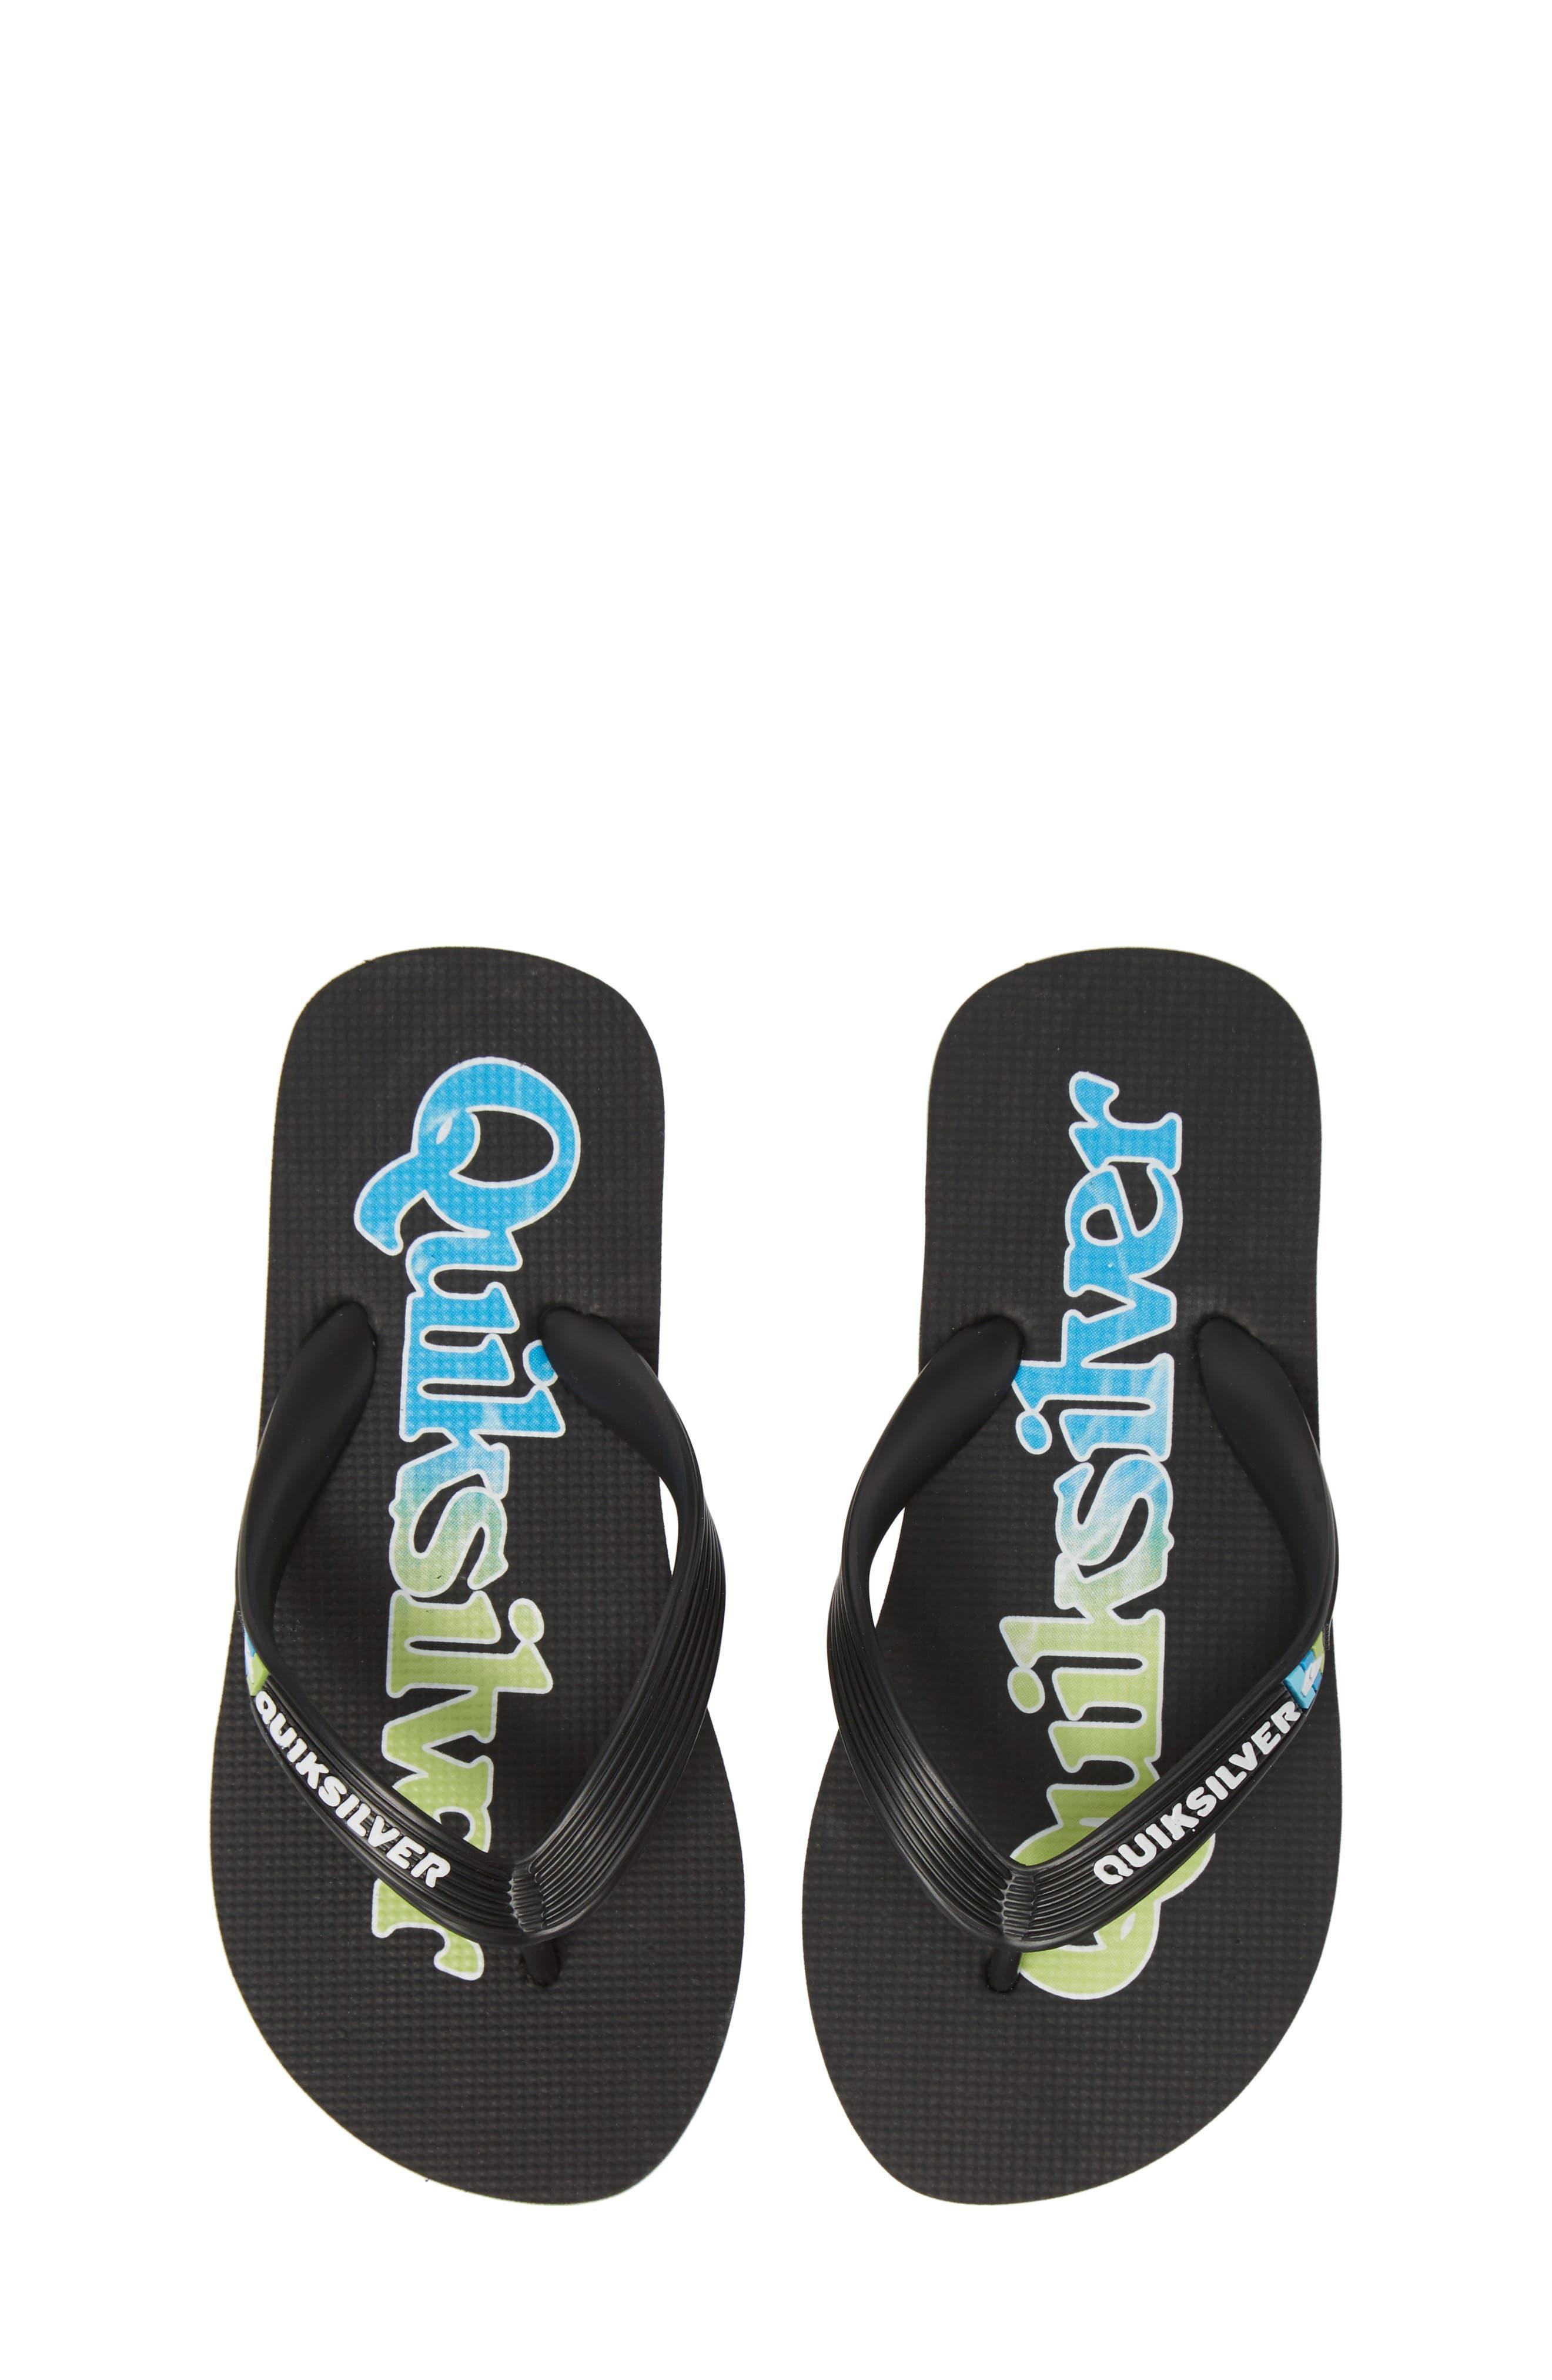 QUIKSILVER, Molokai Wordmark Flip Flop, Main thumbnail 1, color, BLACK/ GREEN/ BLUE